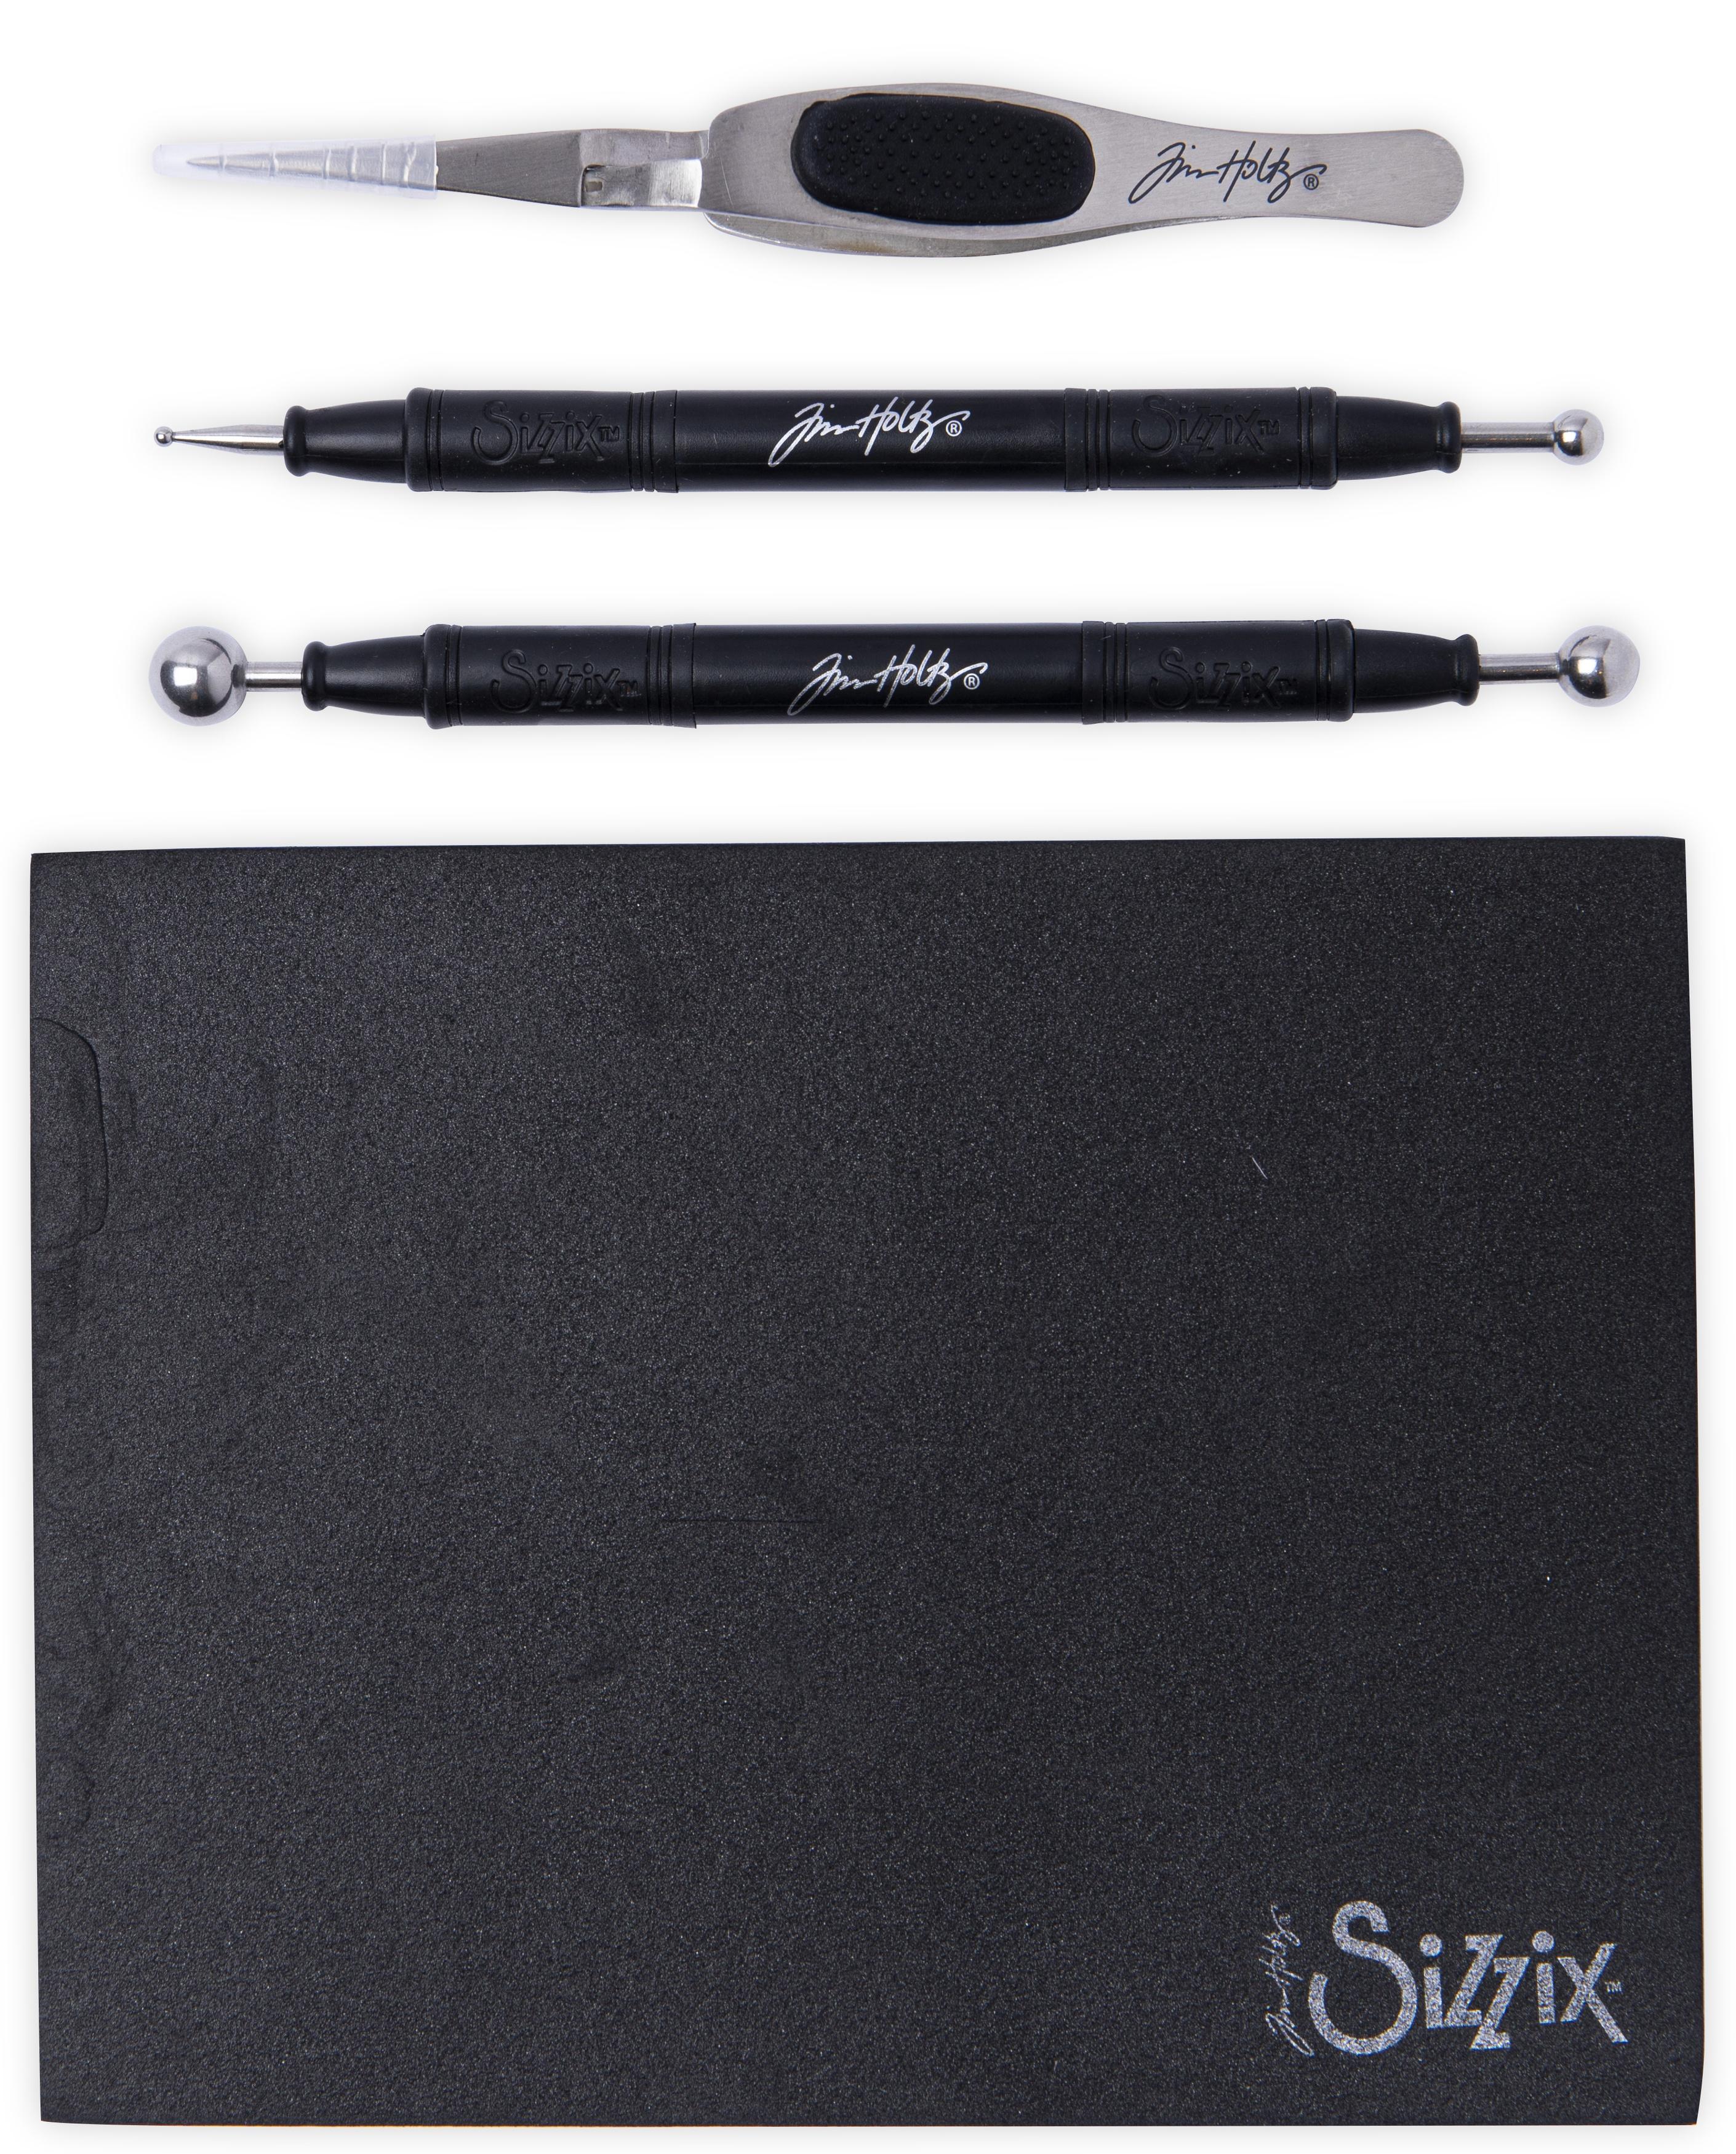 Tim Holtz Tool Shaping Kit-Black